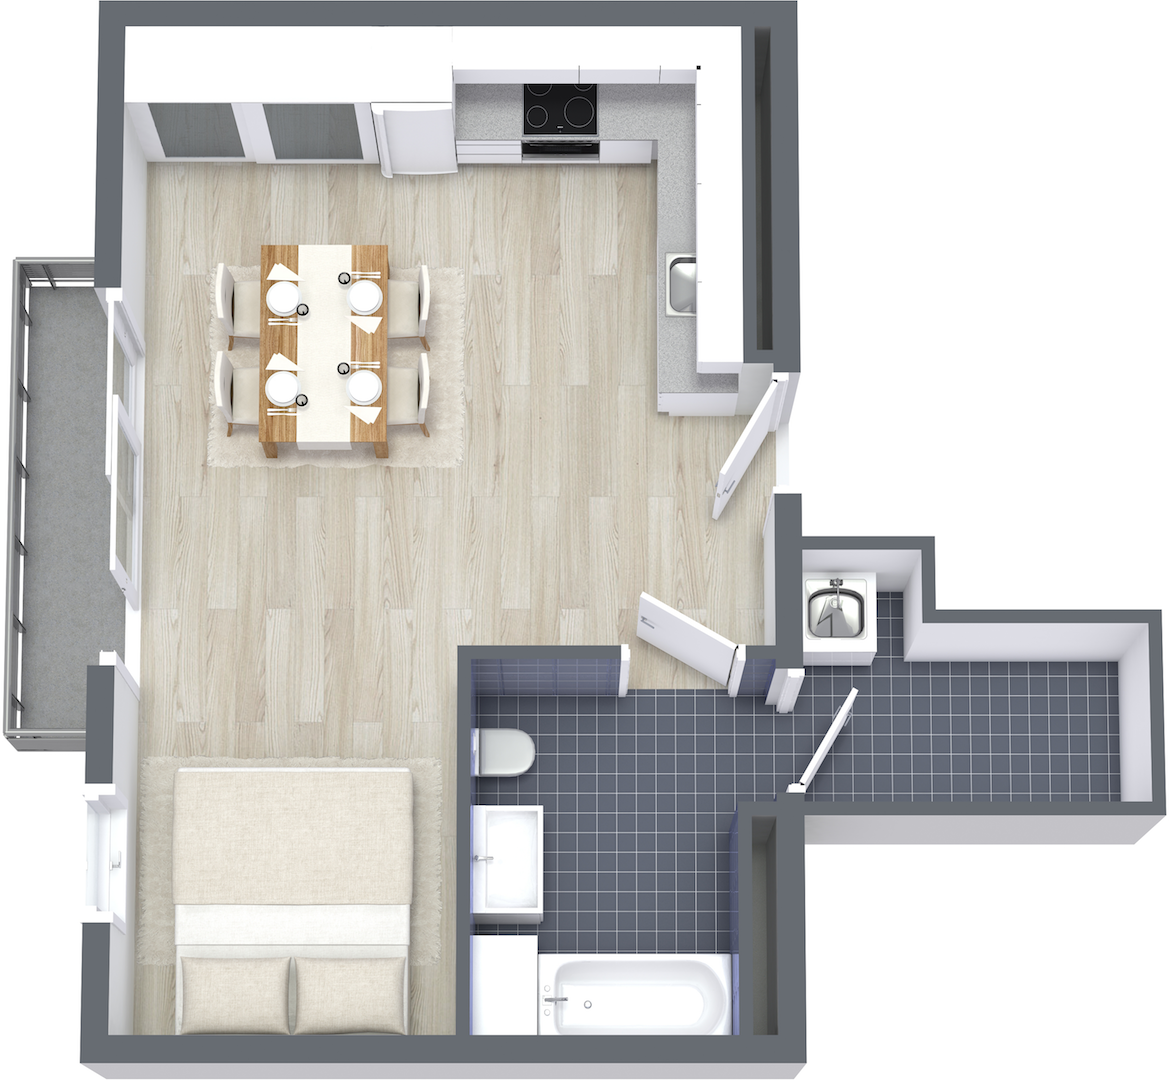 246 Ritch - Level 3 - 3D Floor Plan copy 2.png